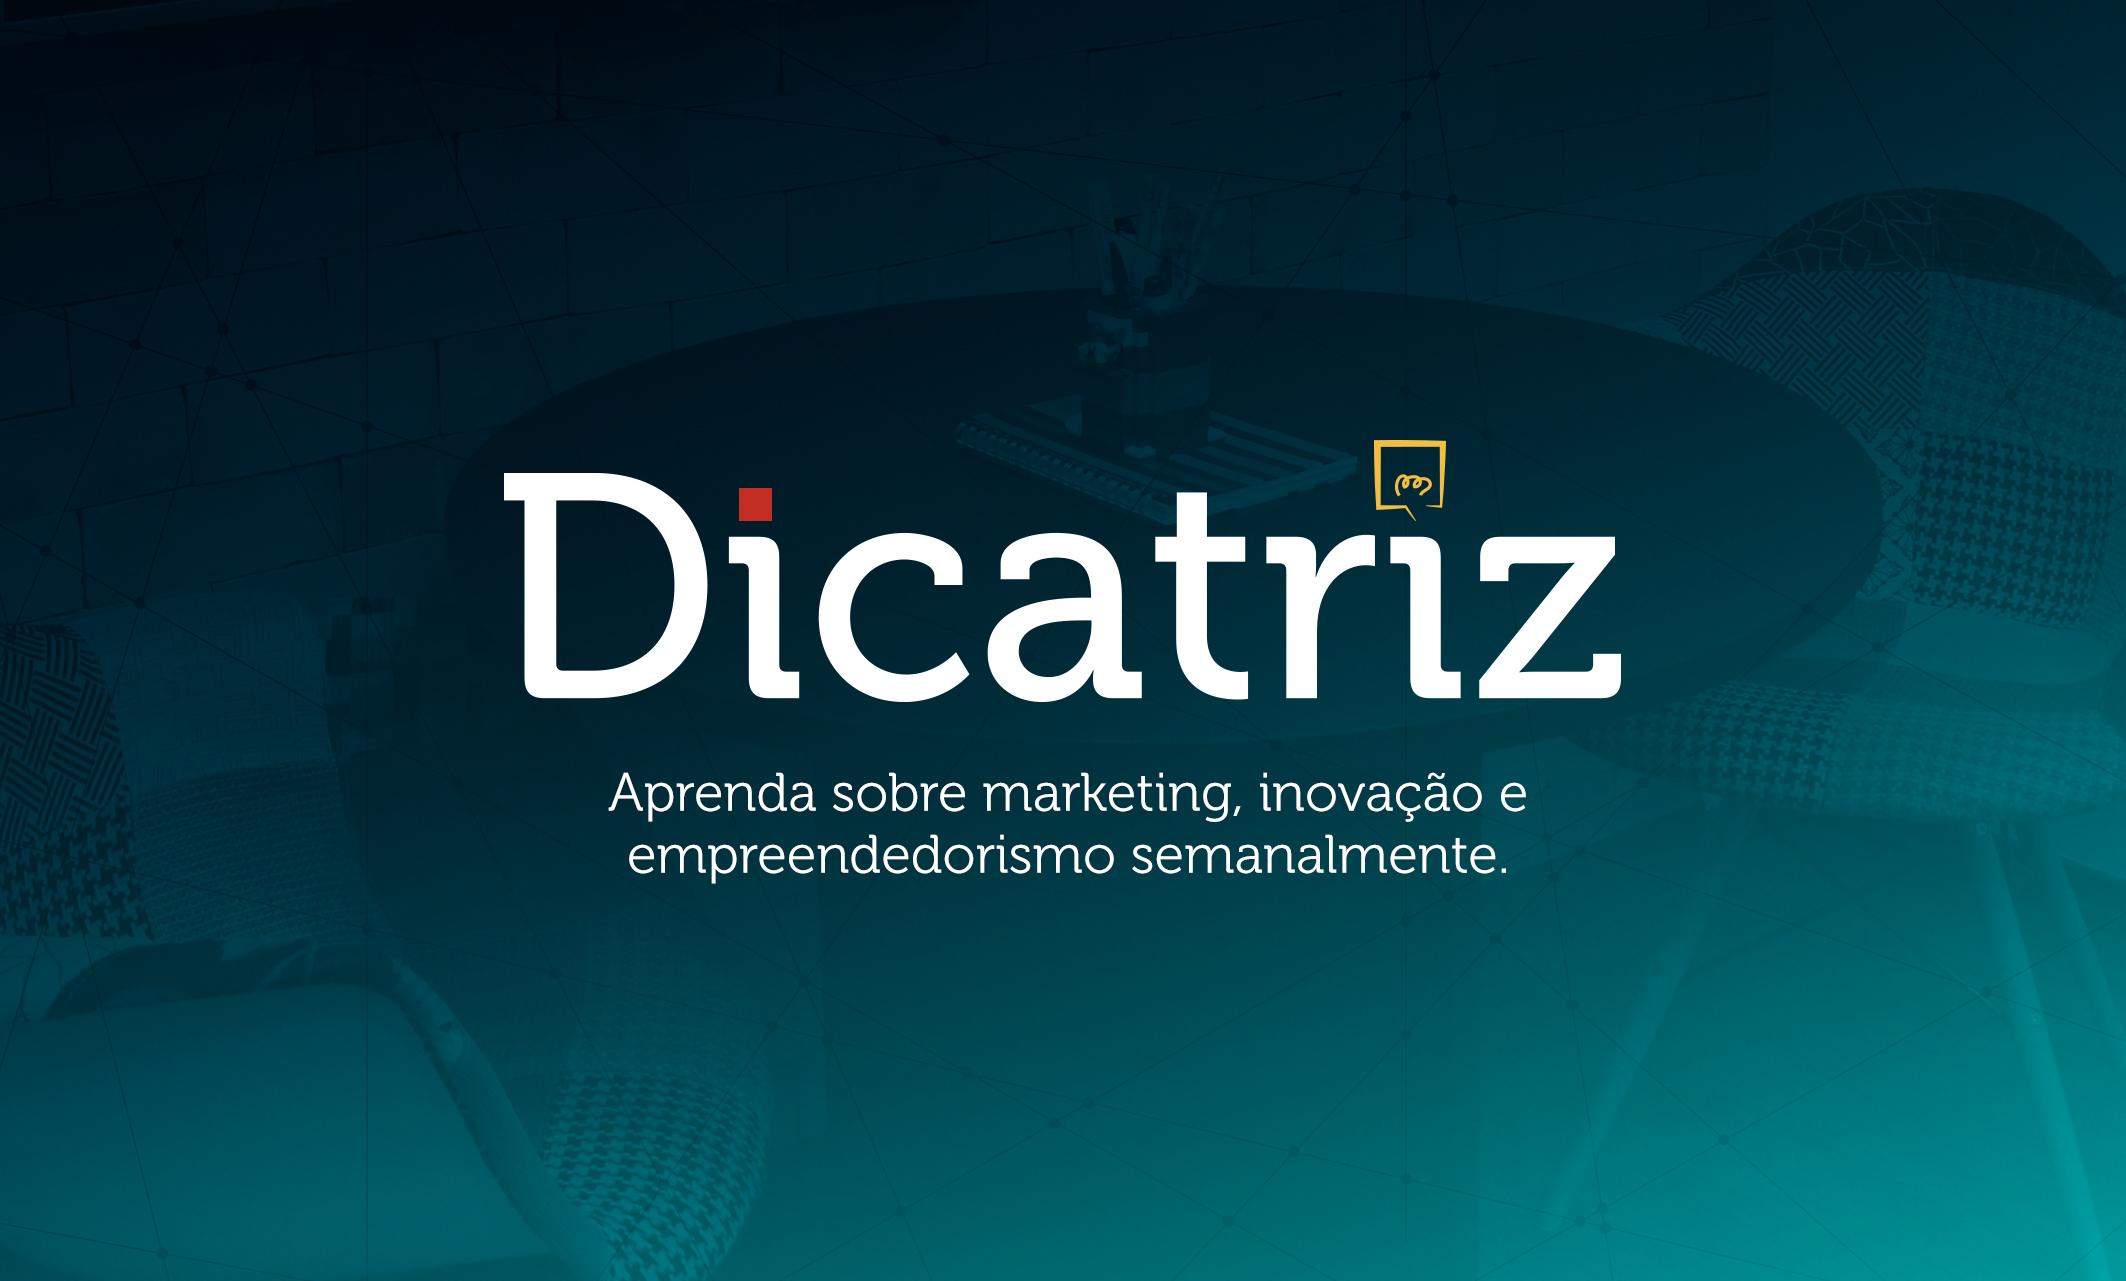 SOCIALTRIZ_banner_capa-1